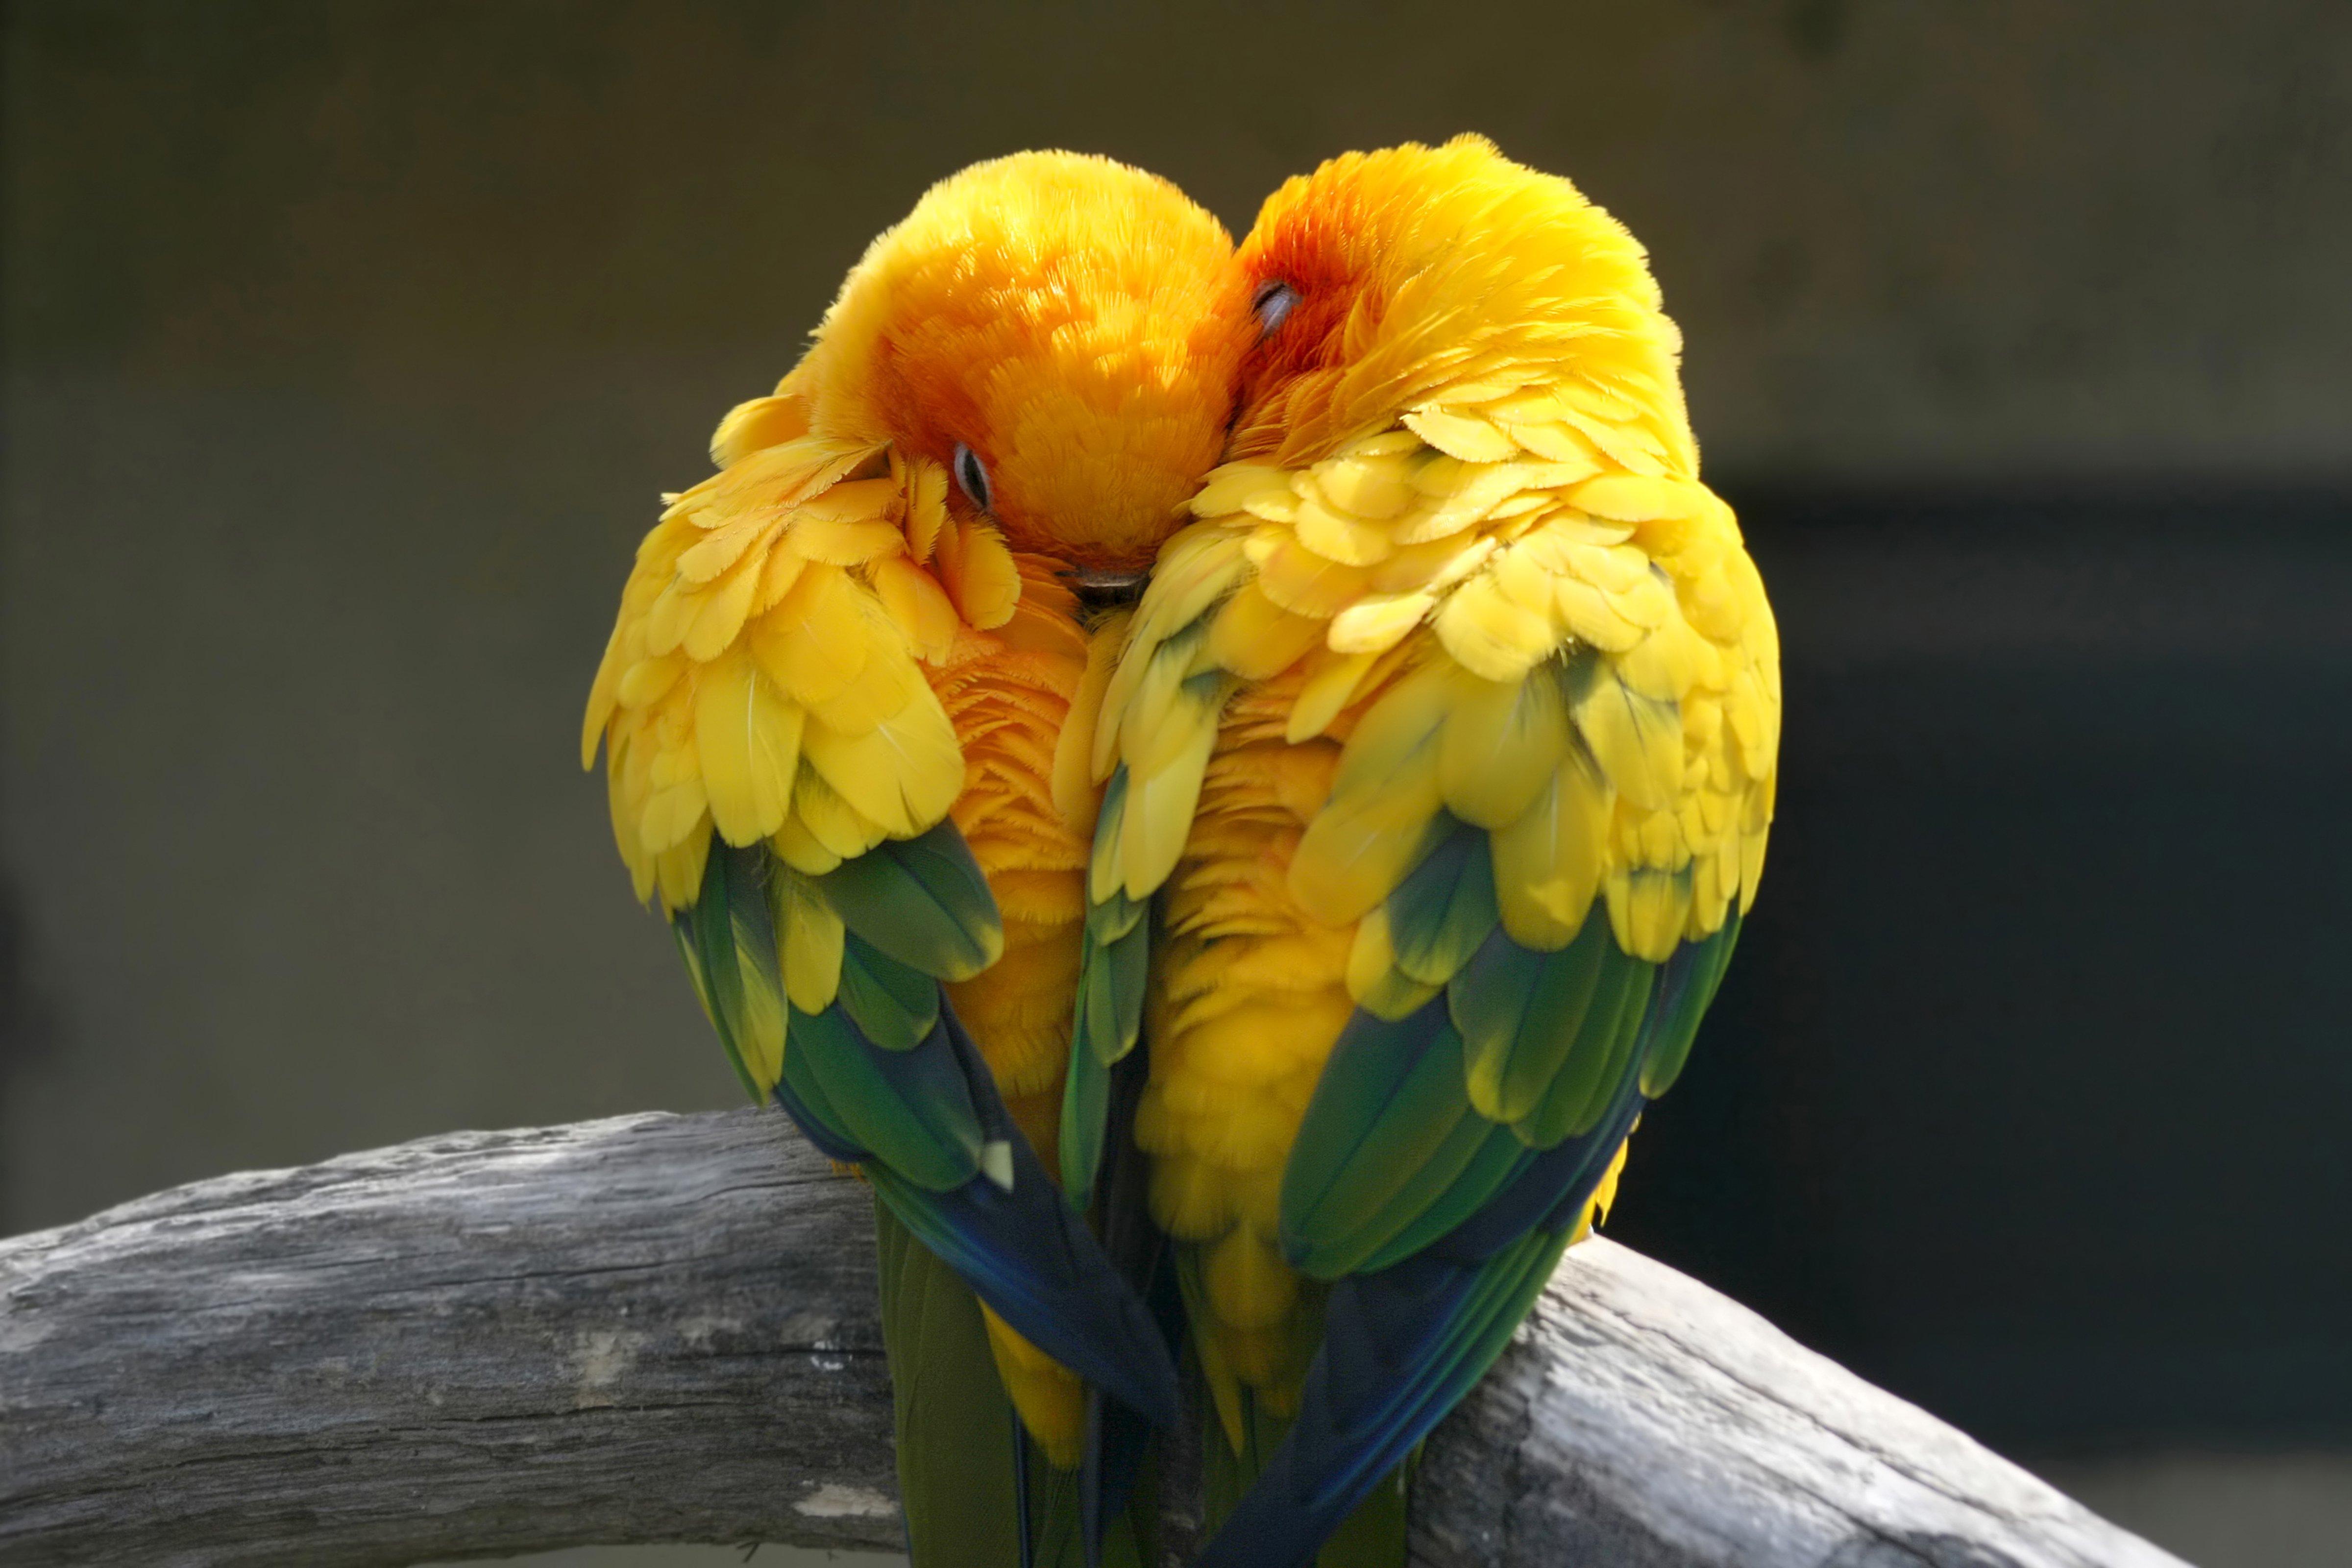 Download Wallpaper Love Parrot - birds-parrot-love-tropical-1226738  Picture_999927.jpg